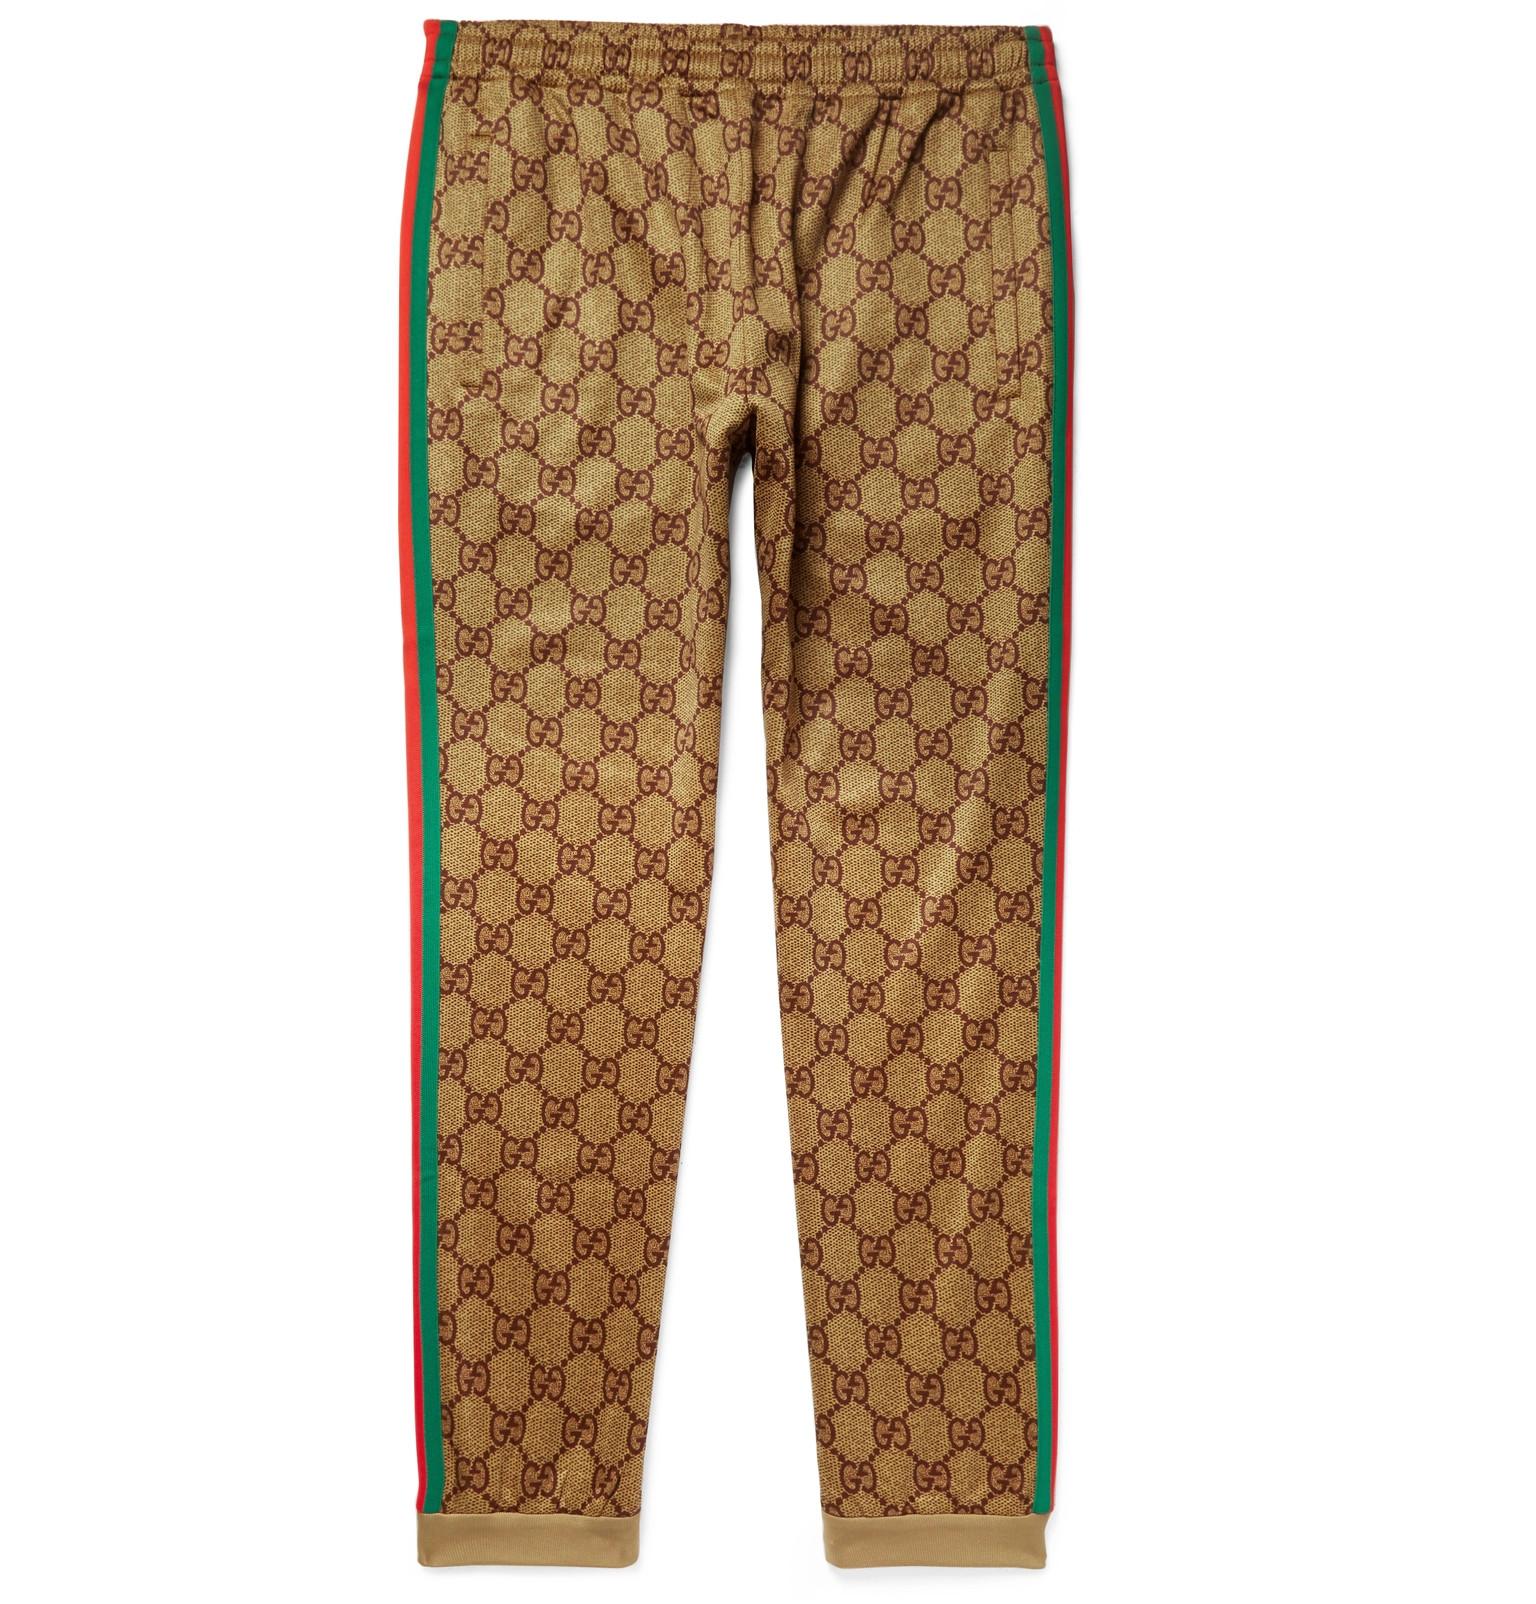 724c5c8afa1cb Gucci - Webbing-Trimmed Logo-Print Tech-Jersey Sweatpants